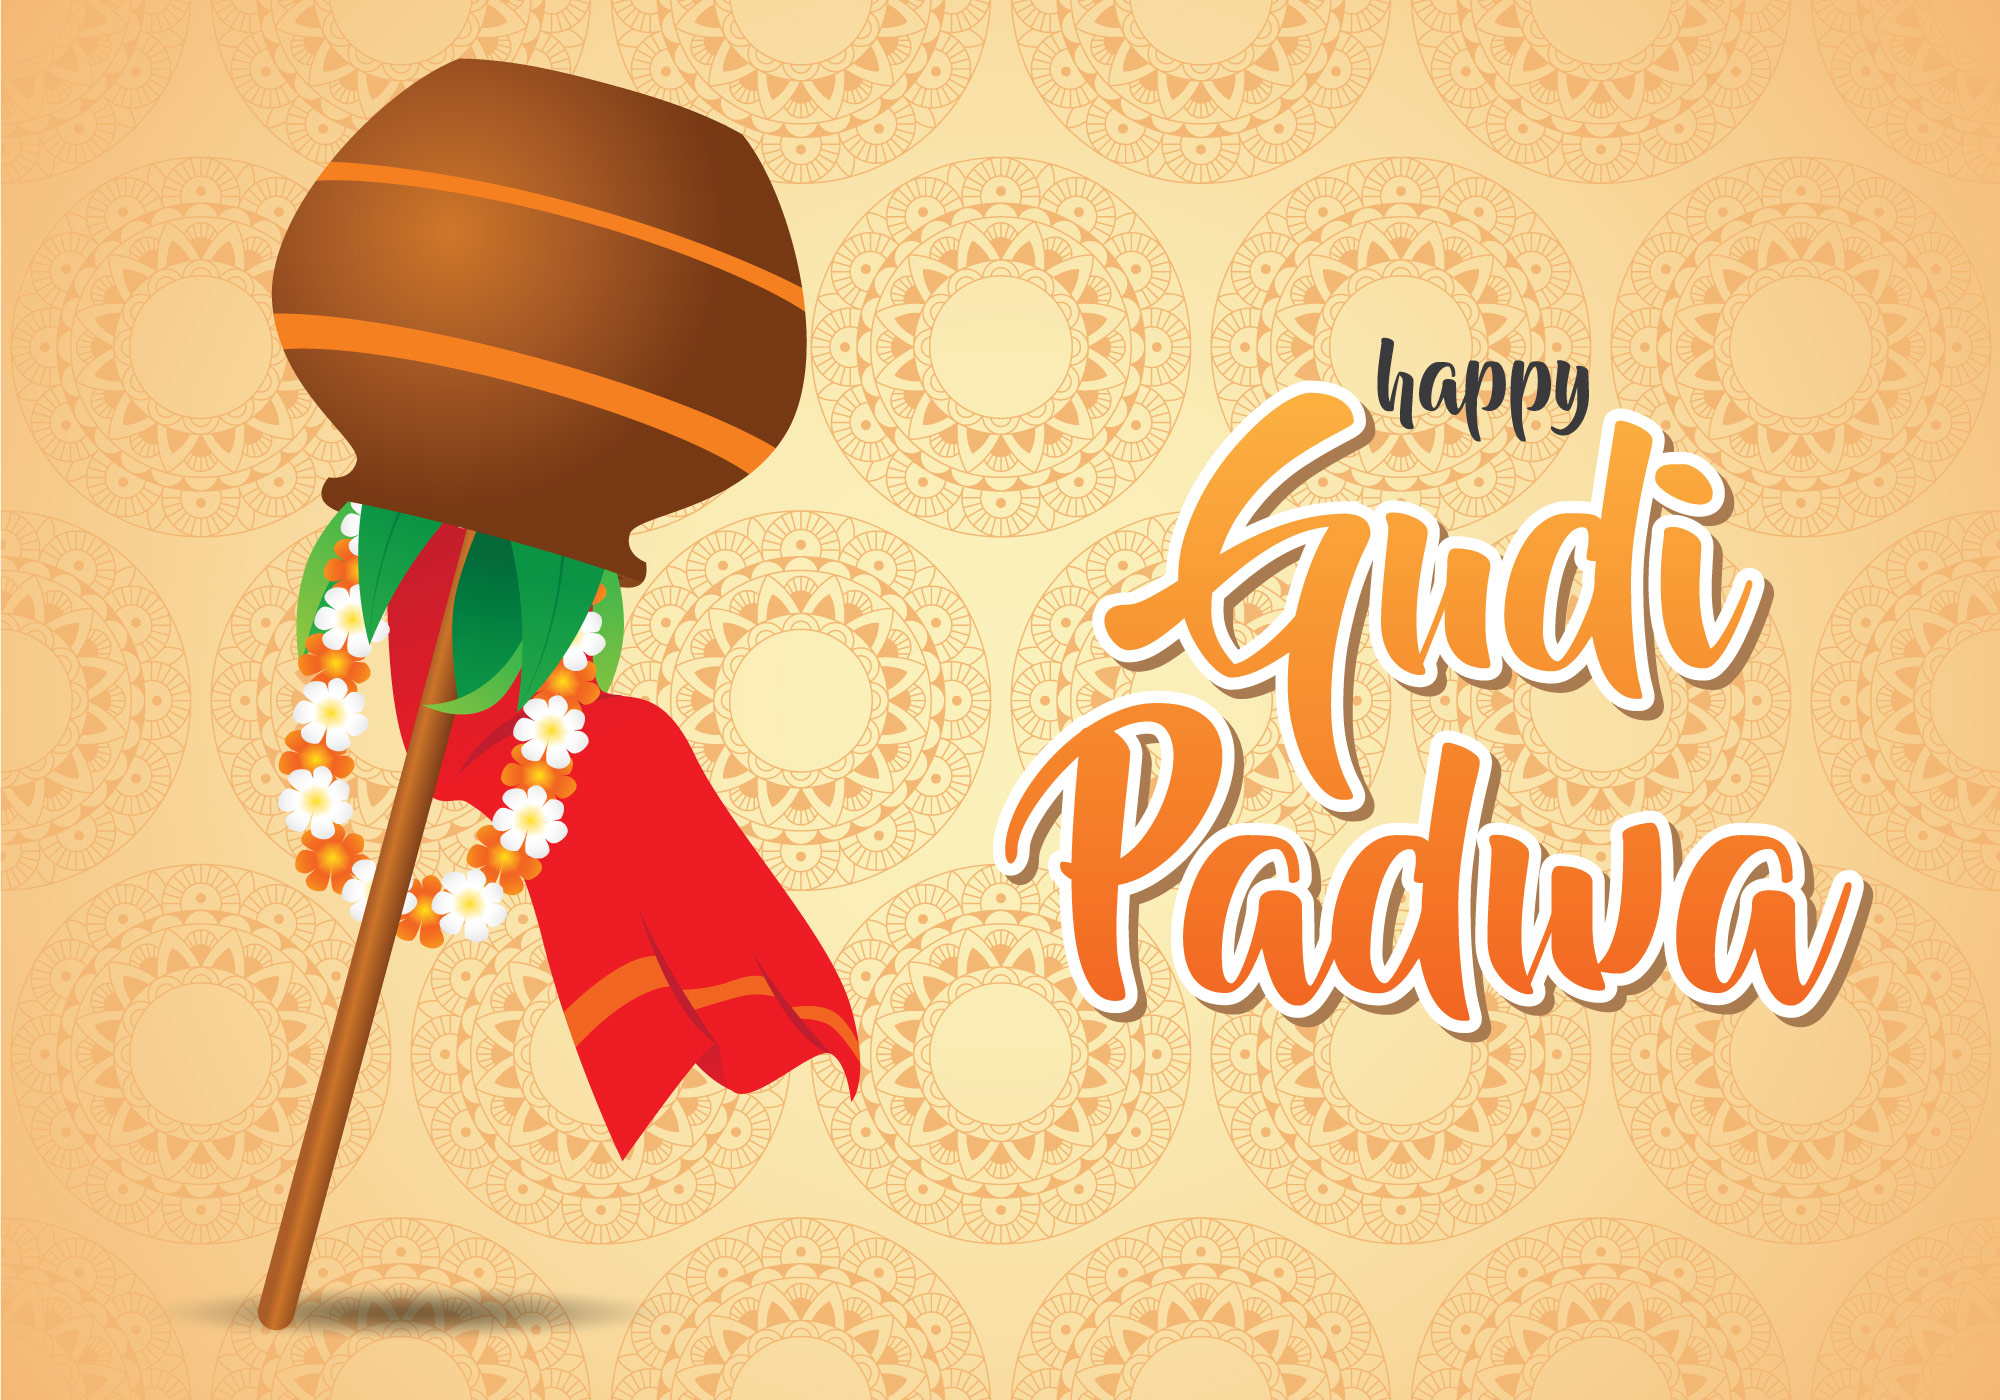 Happy Gudi Padwa Illustration Download Free Vector Art Stock